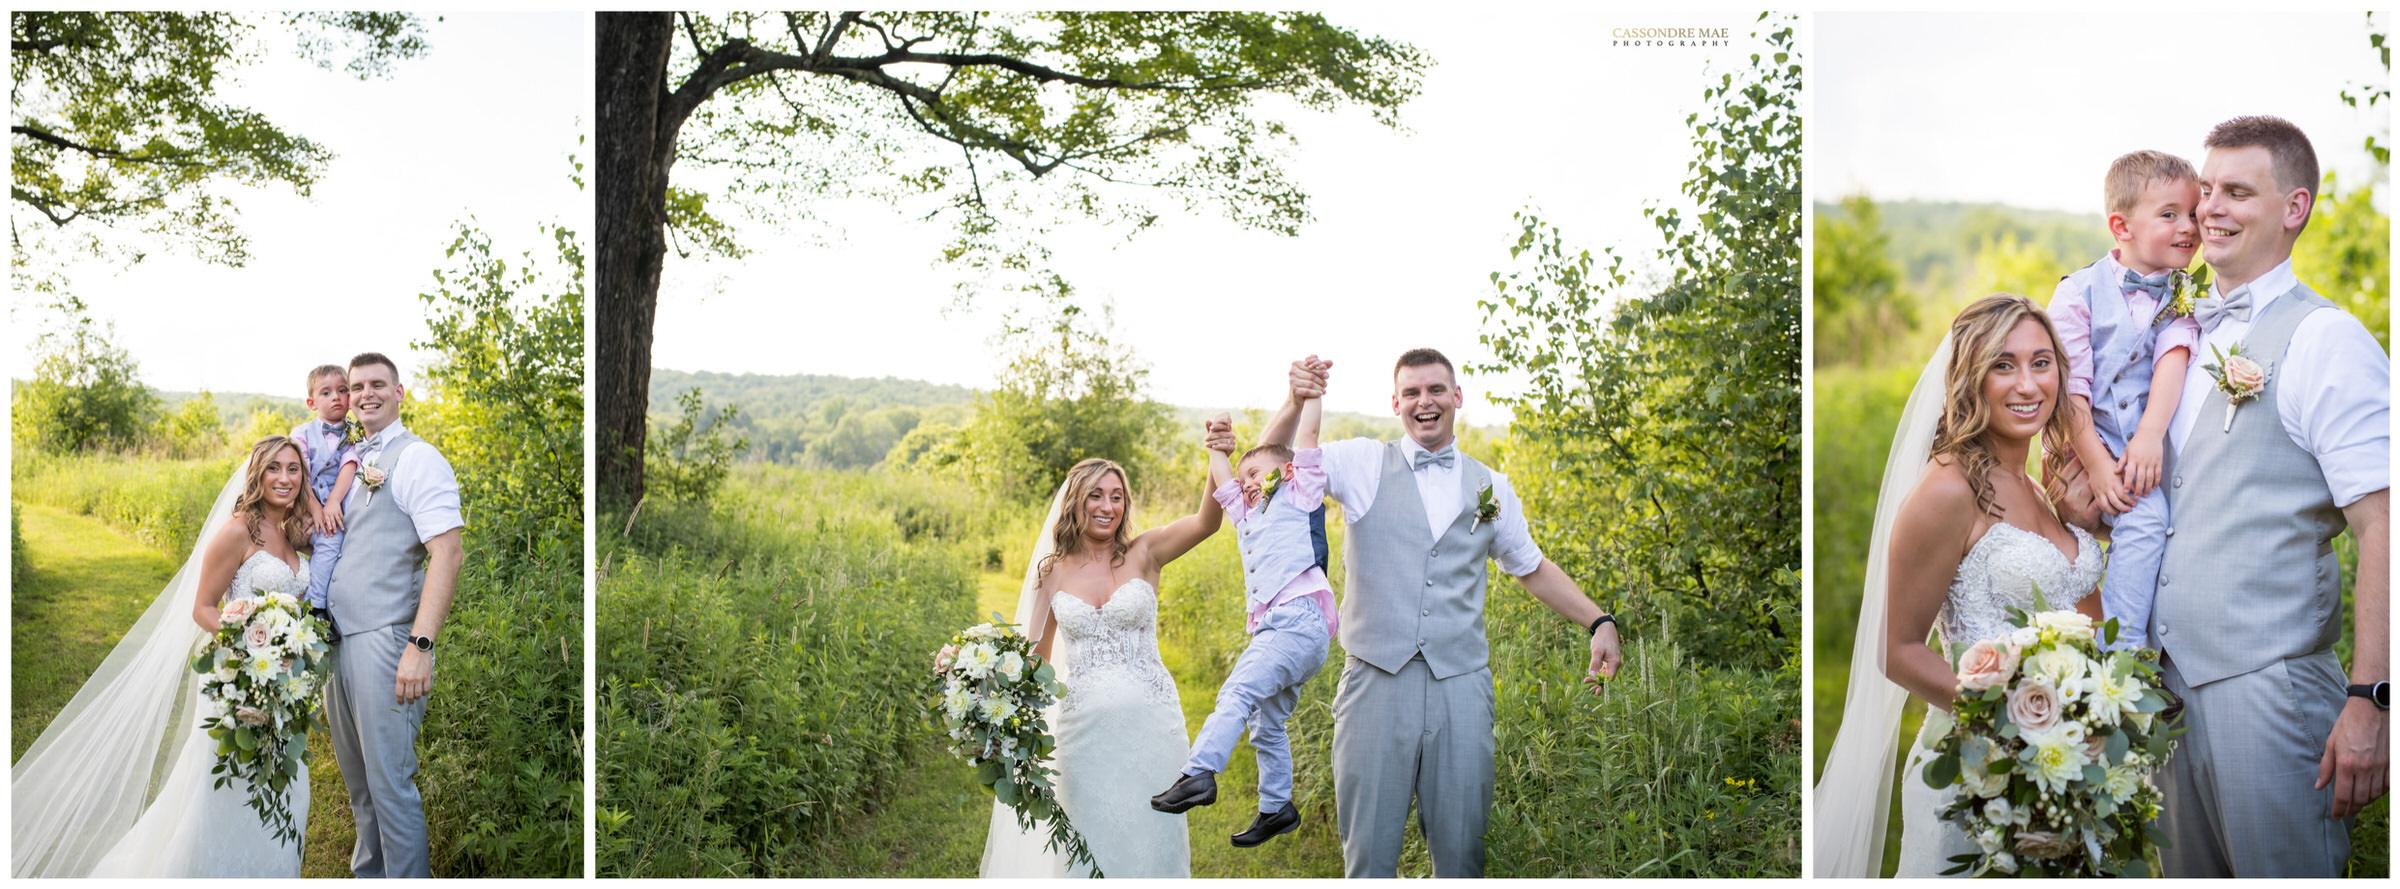 Cassondre Mae Photography Hudson Valley Wedding 22.jpg